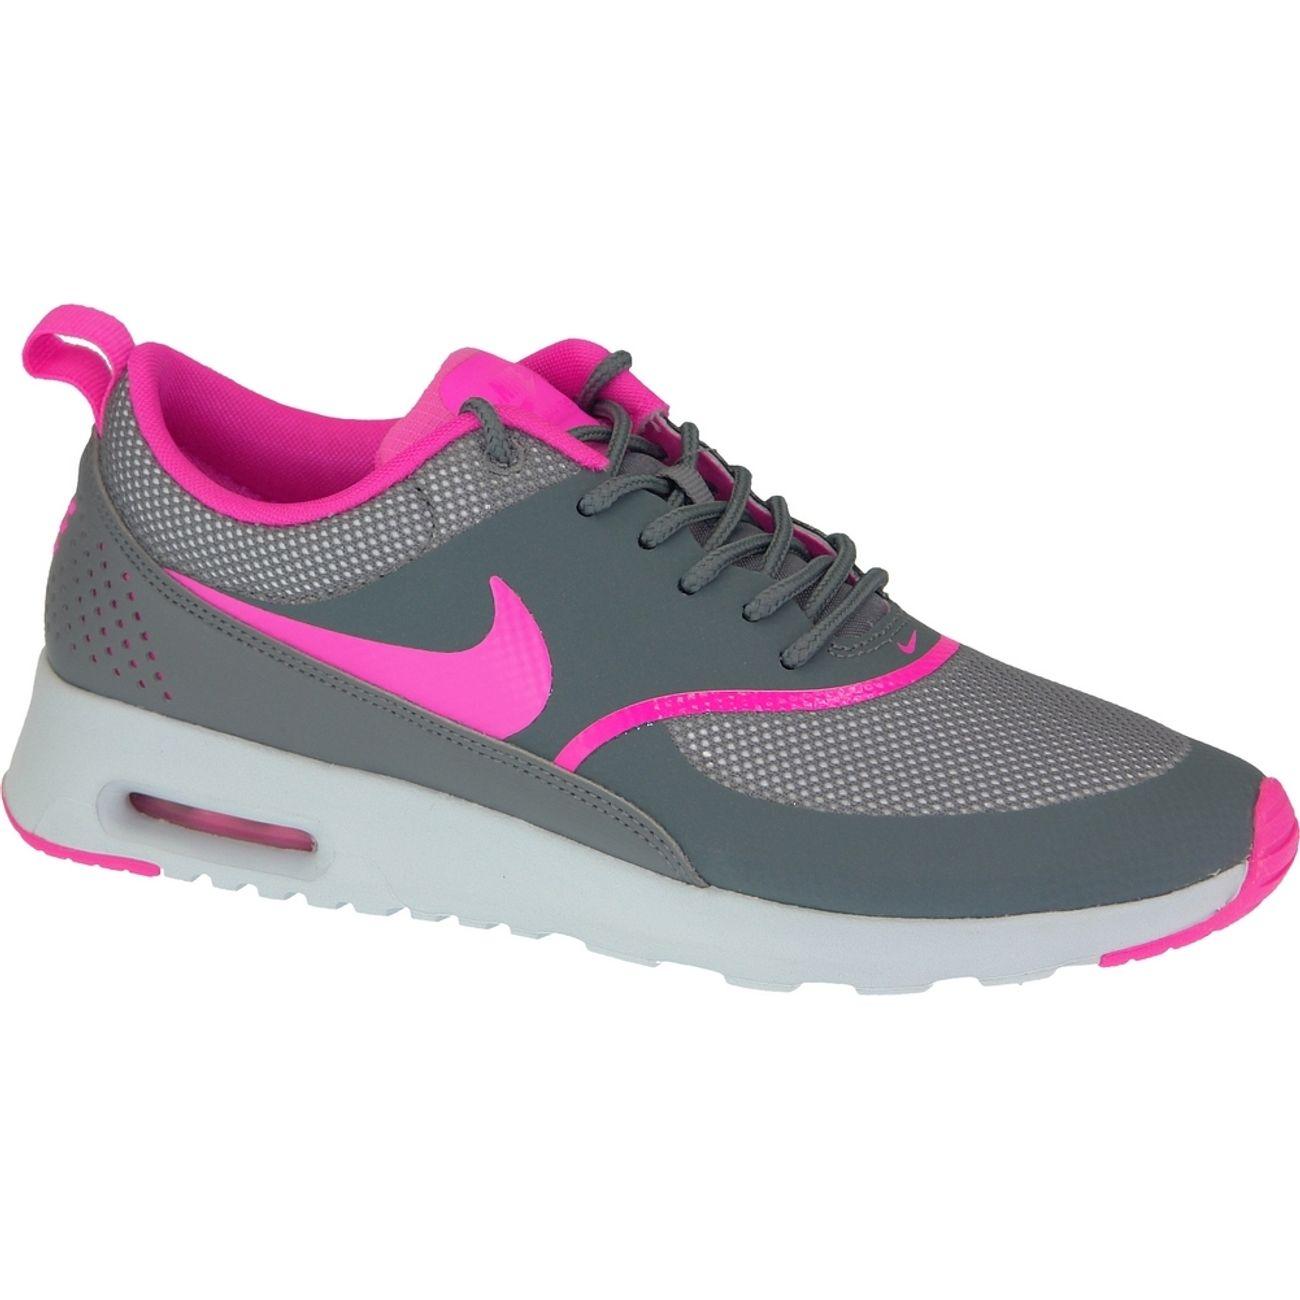 Nike Air Max Thea Mid bordeaux Chaussures Baskets femme